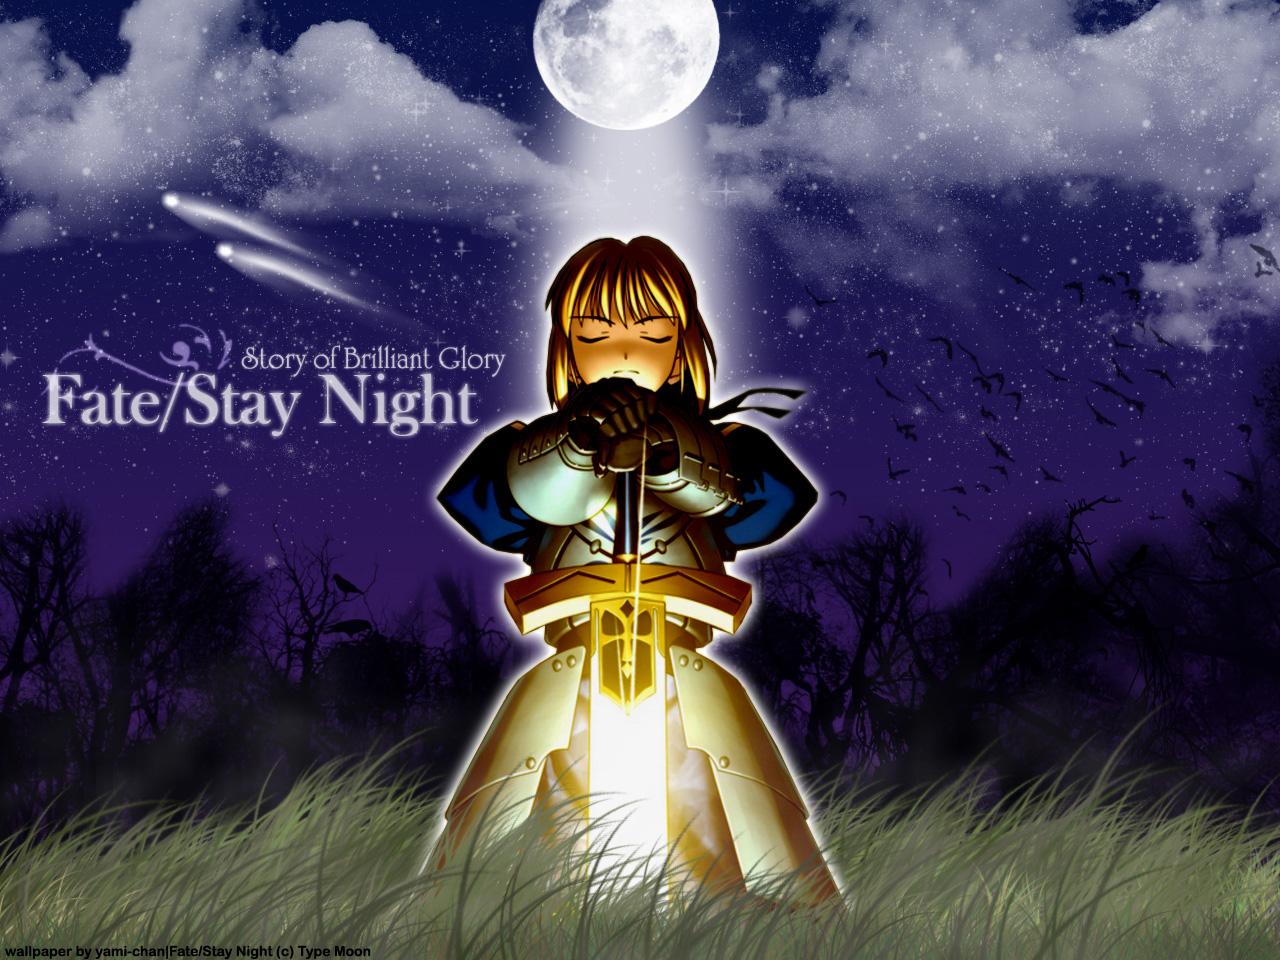 [AnimePaper]wallpapers_Fate-Stay-Night_yami-chan_-edit891